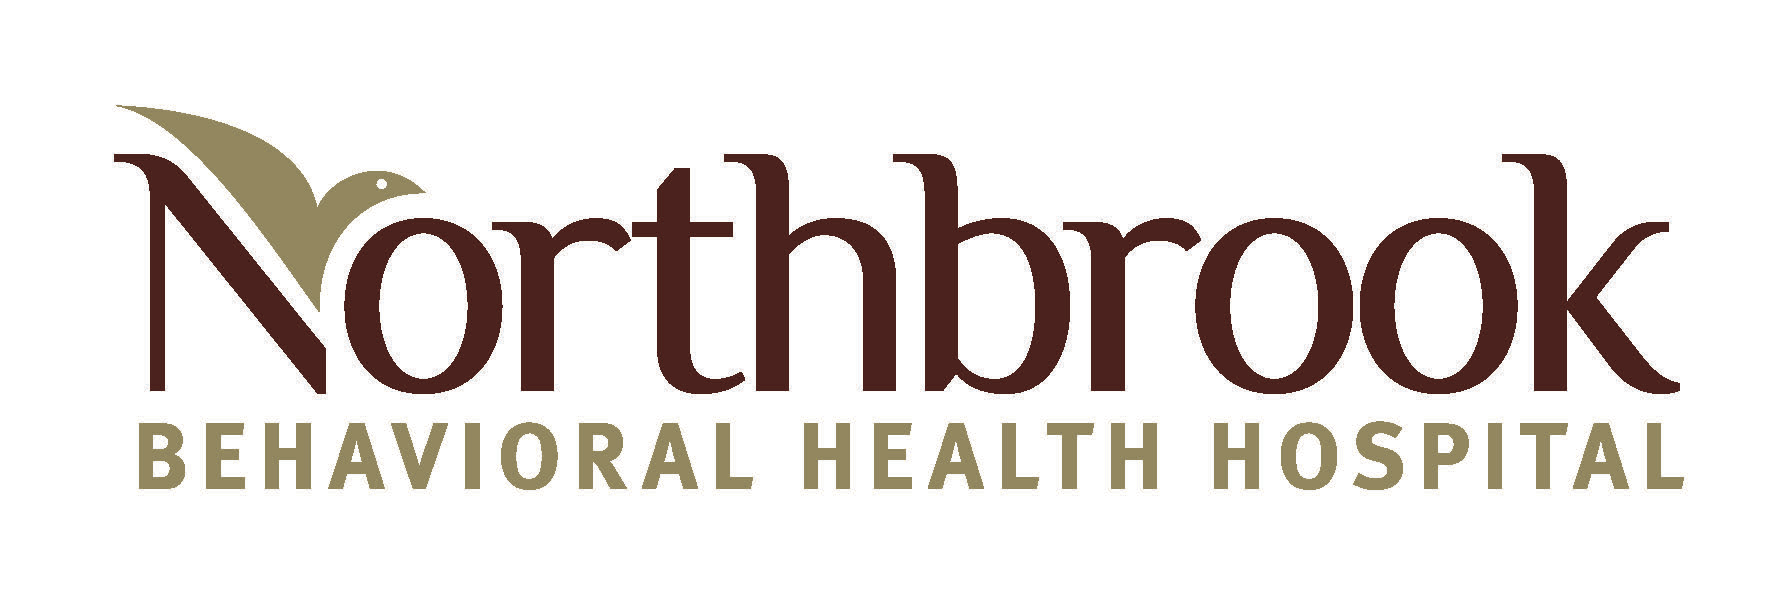 Northbrook Behavioral Health Hospital Logo